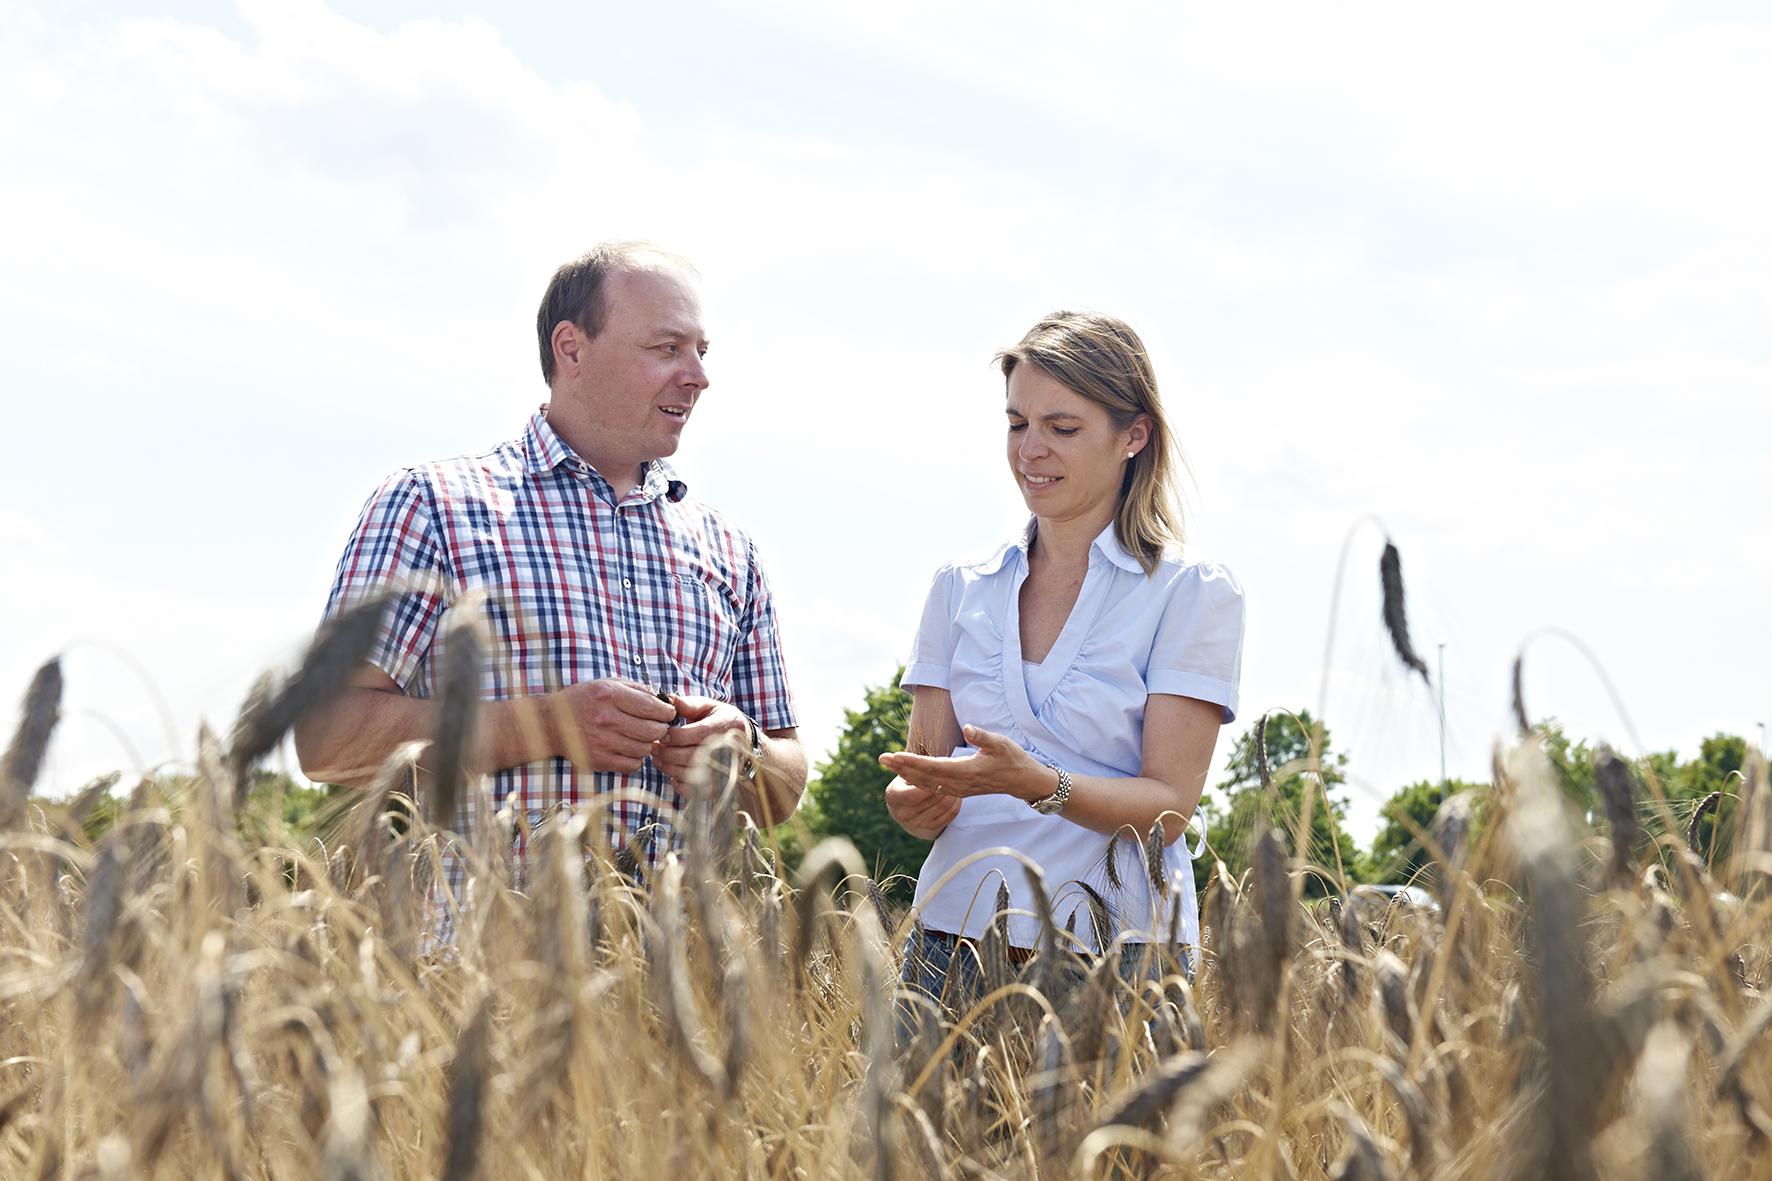 Landwirt Christian Niebling aus Neu-Ulm